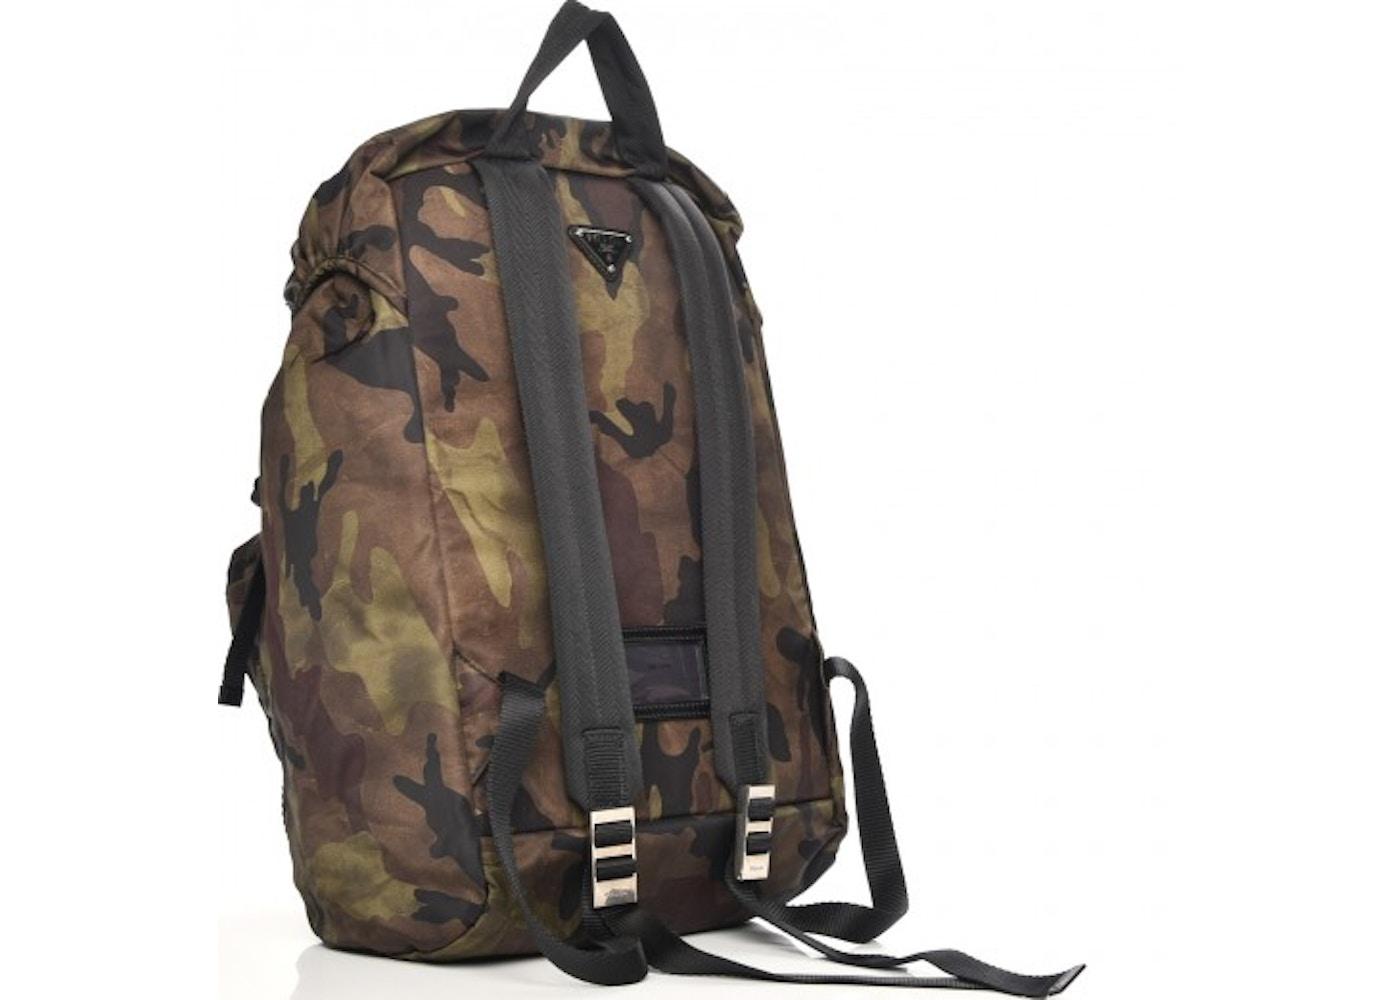 917fac32dcd2 Prada Mimetico Backpack Tessuto Camouflage Green/Brown/Black